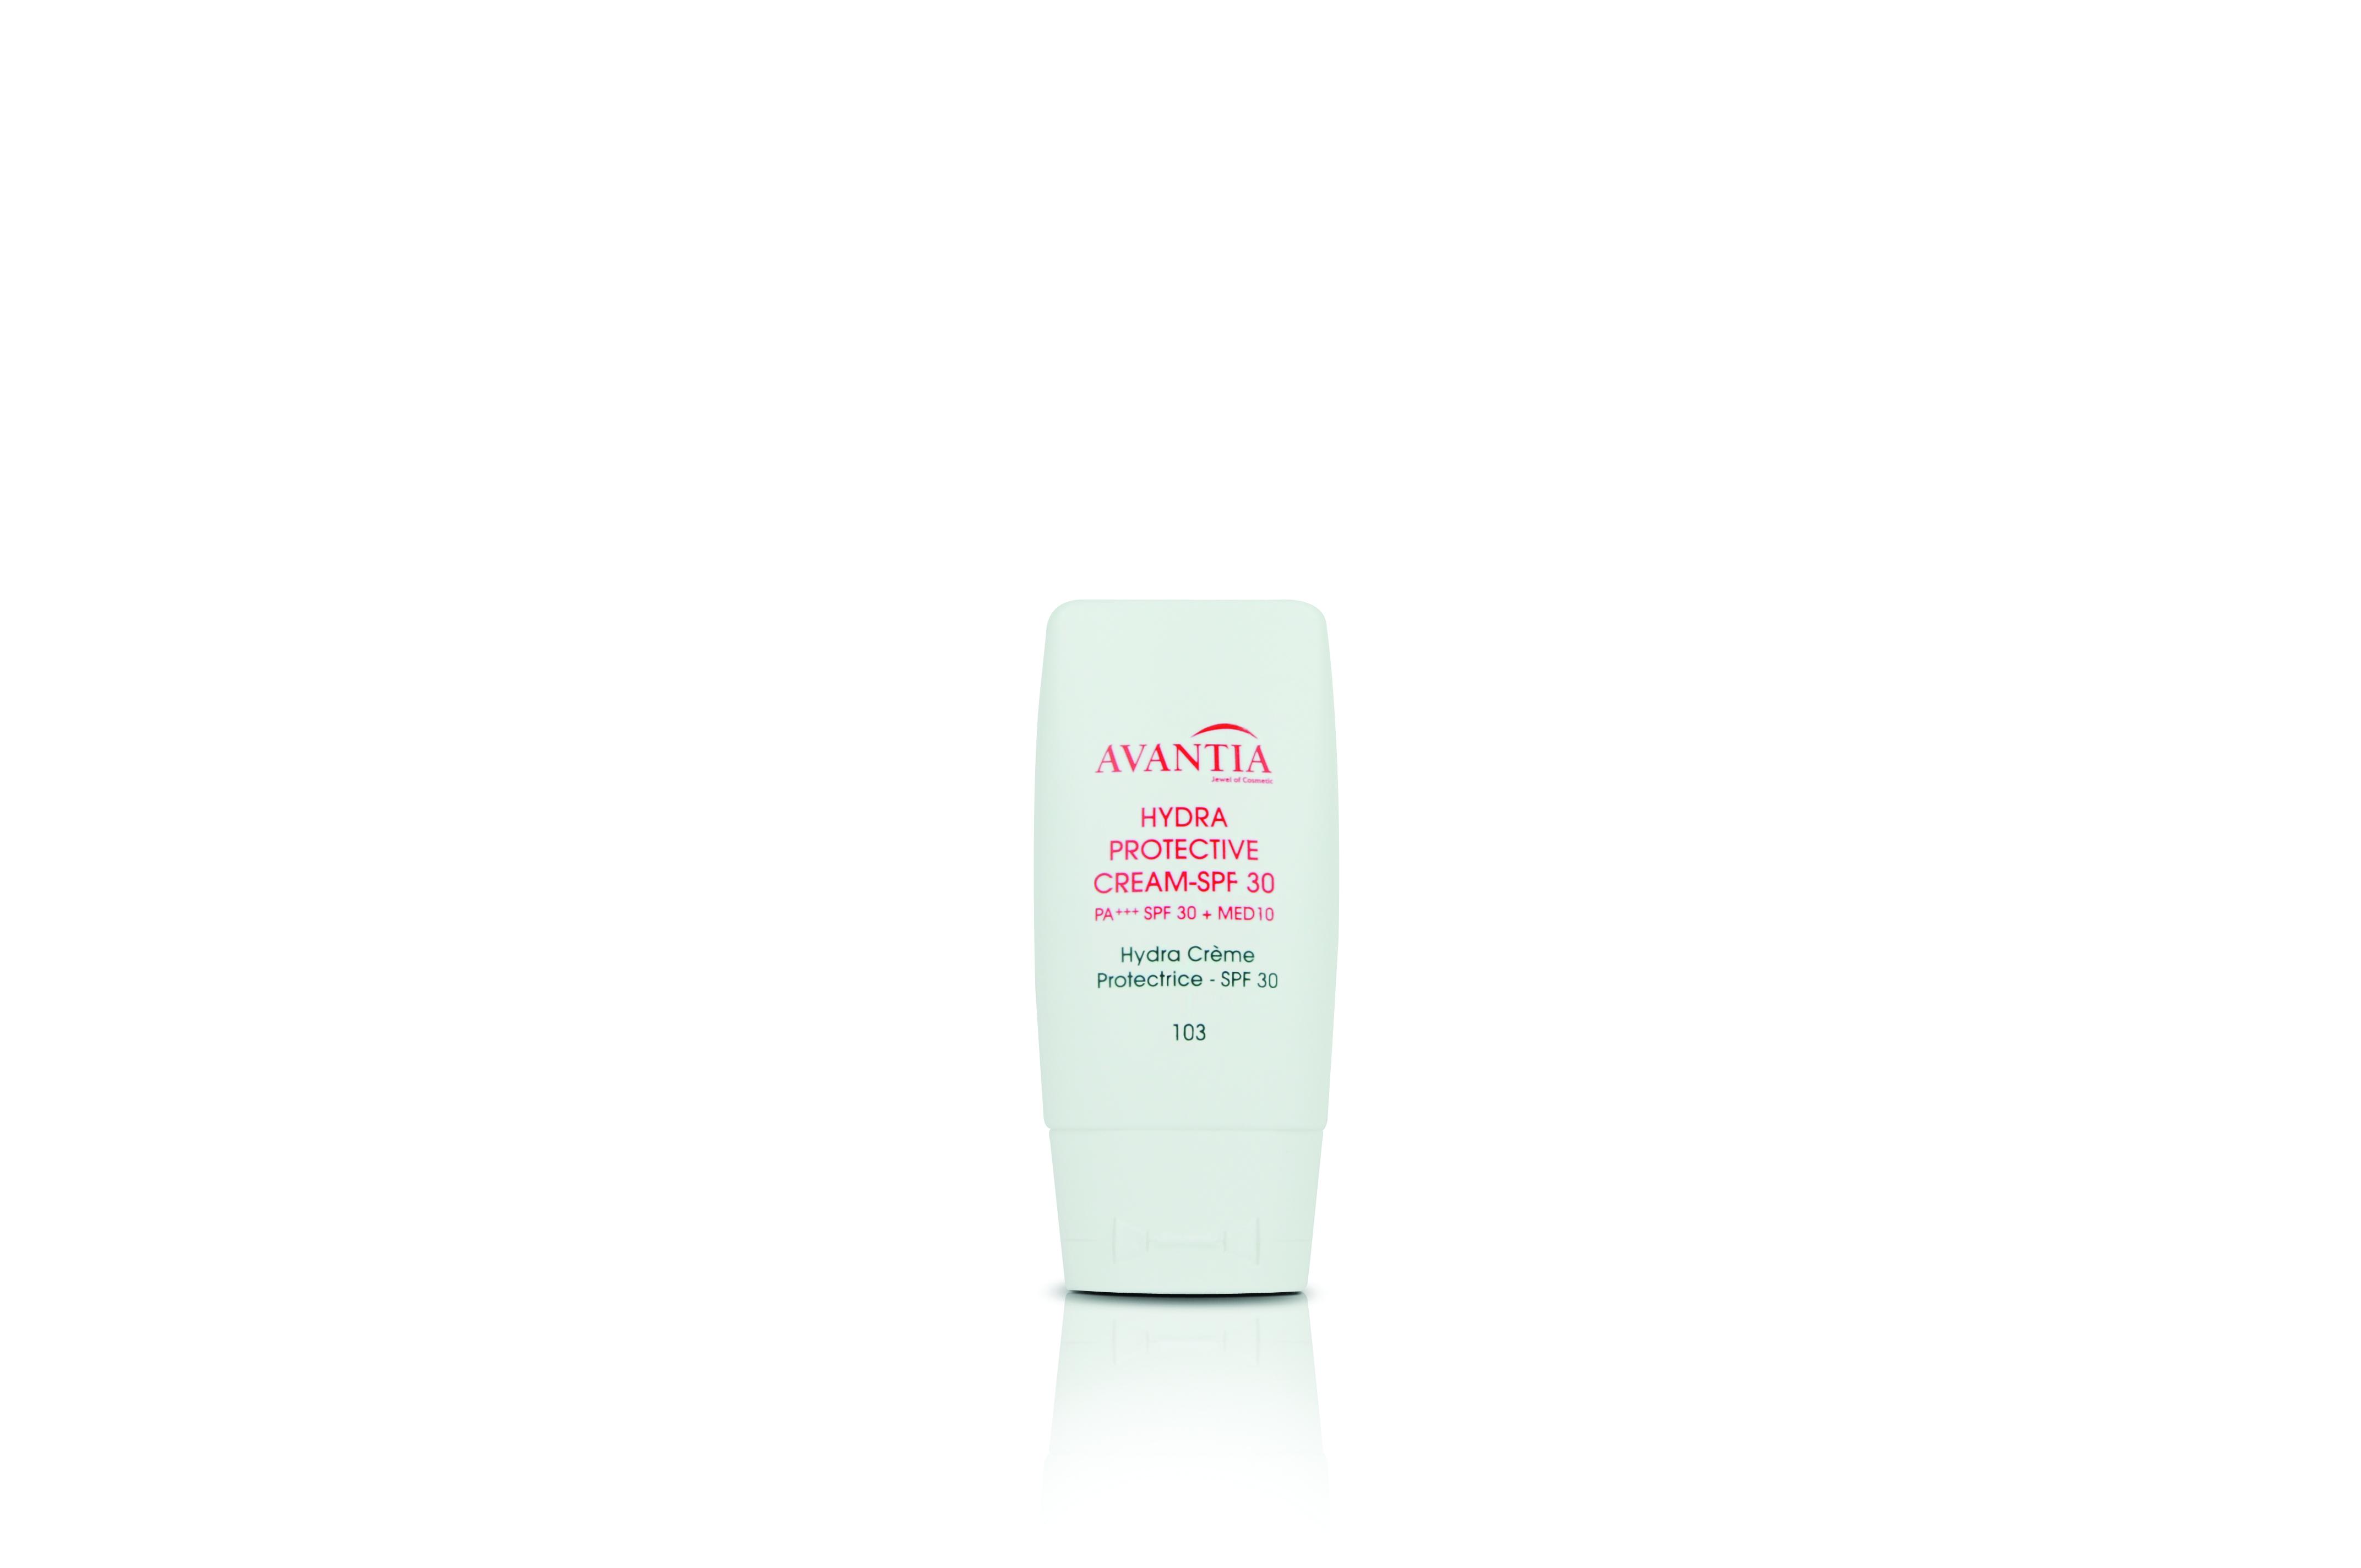 Hydra Protective Cream-SPF 30.jpg